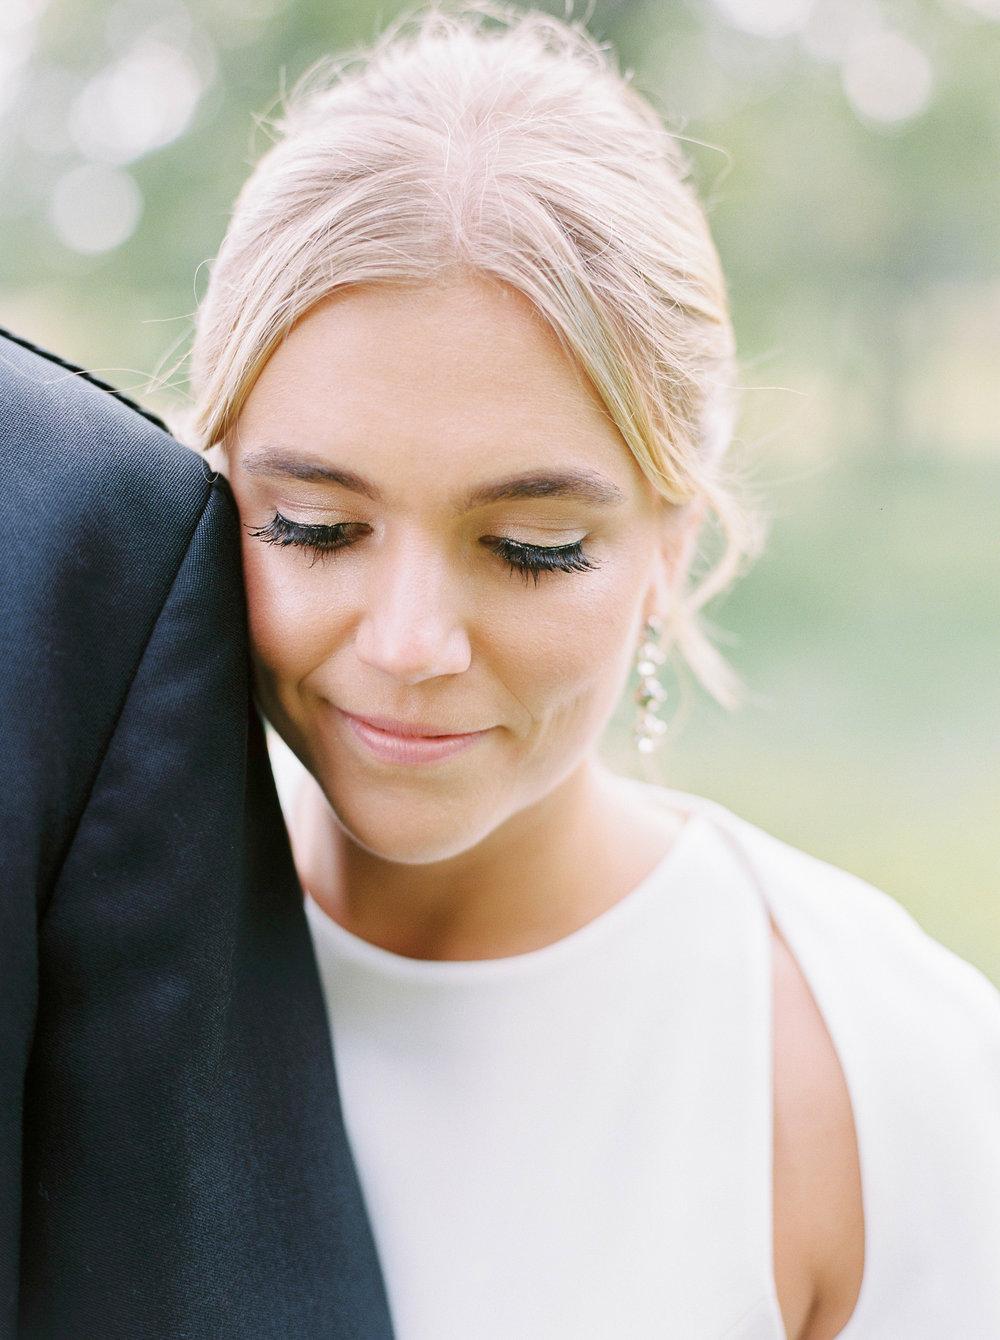 0279-Geneva-Ian-Wedding-Toronto Golf Club-When He Found Her-TorontoPhotographer.jpg